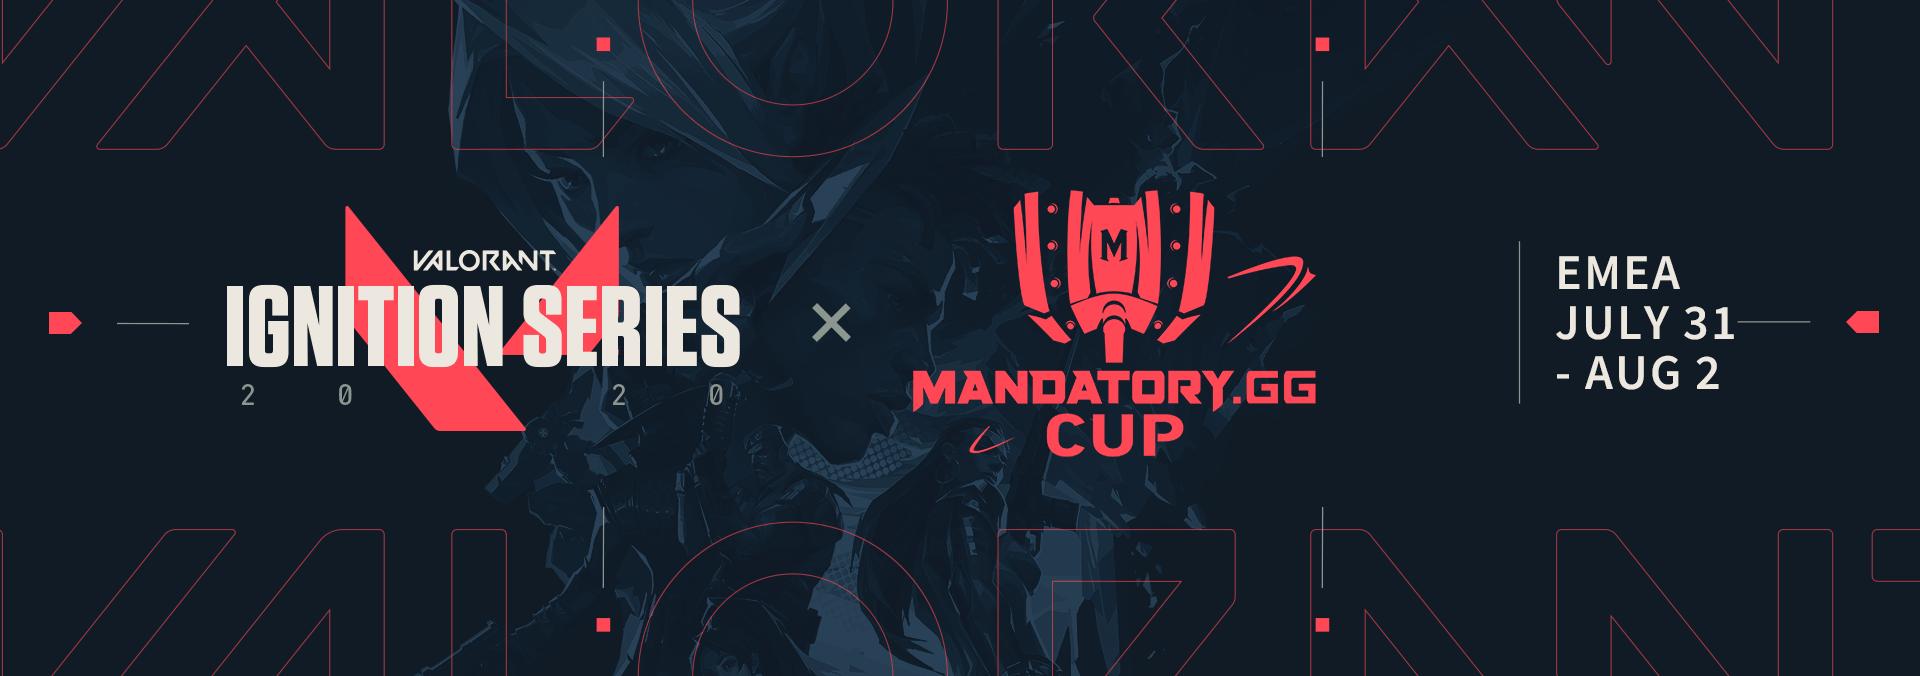 Mandatory.gg Cup.